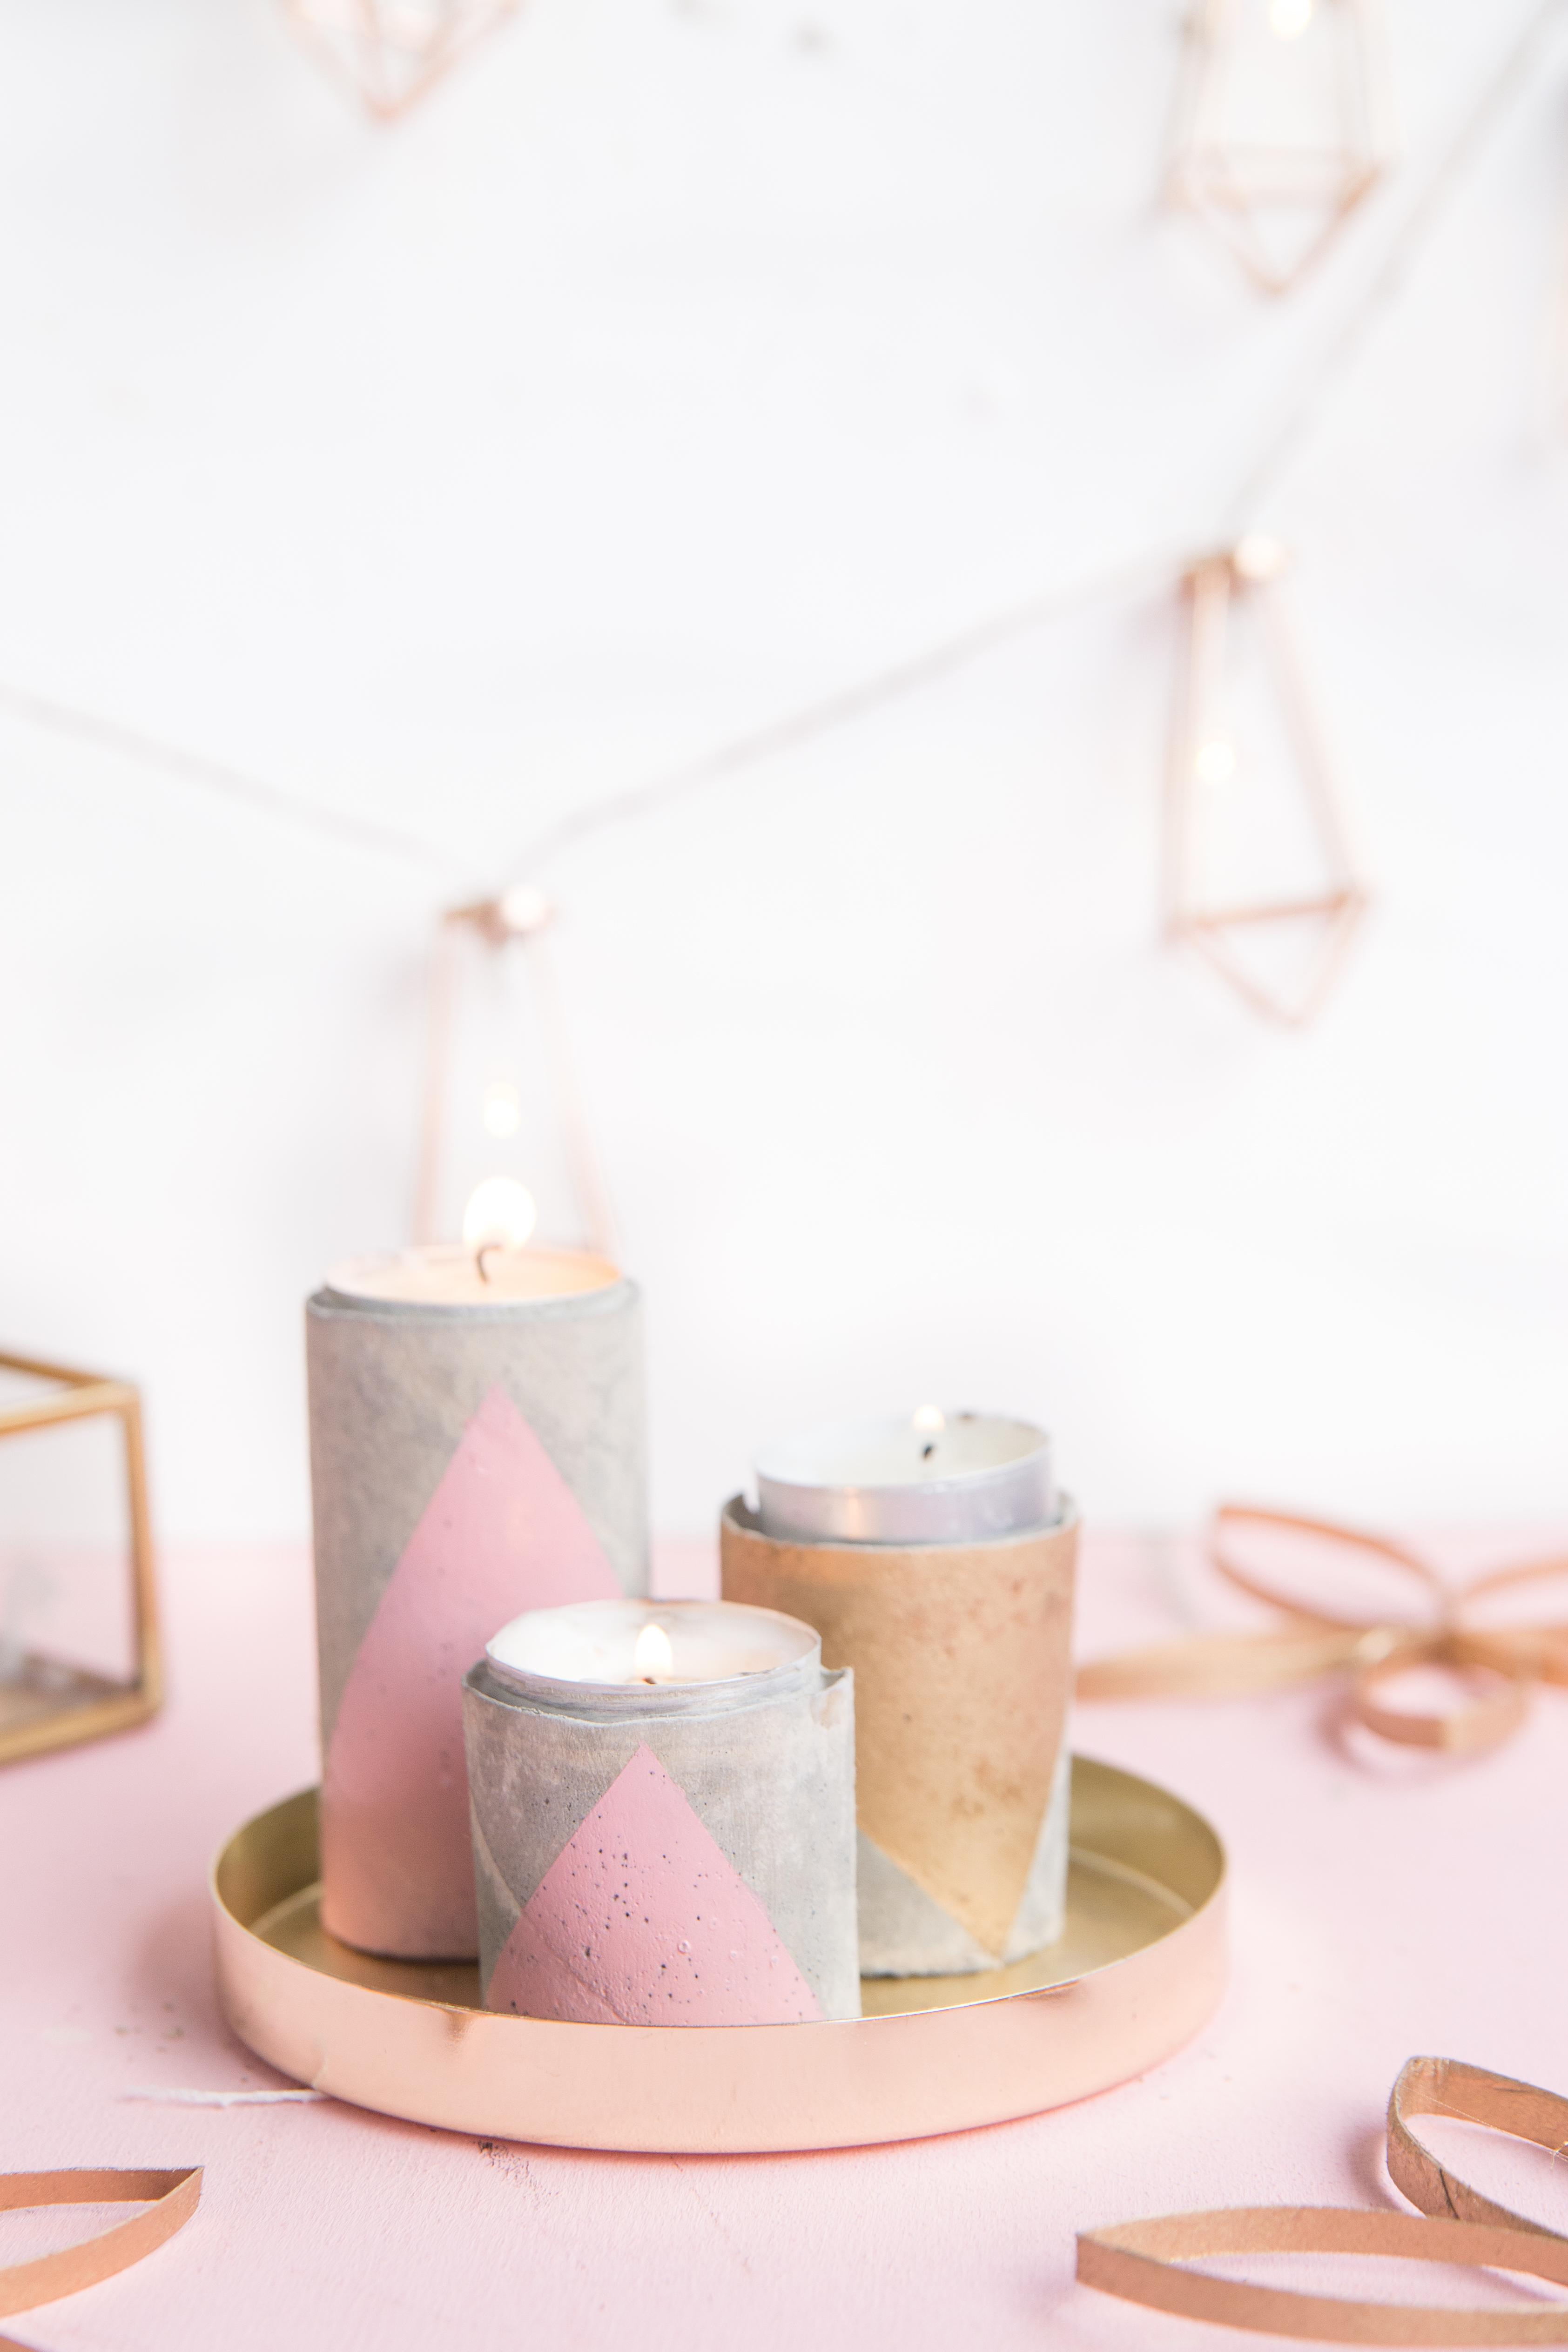 Schön Kerzenhalter Beton Design